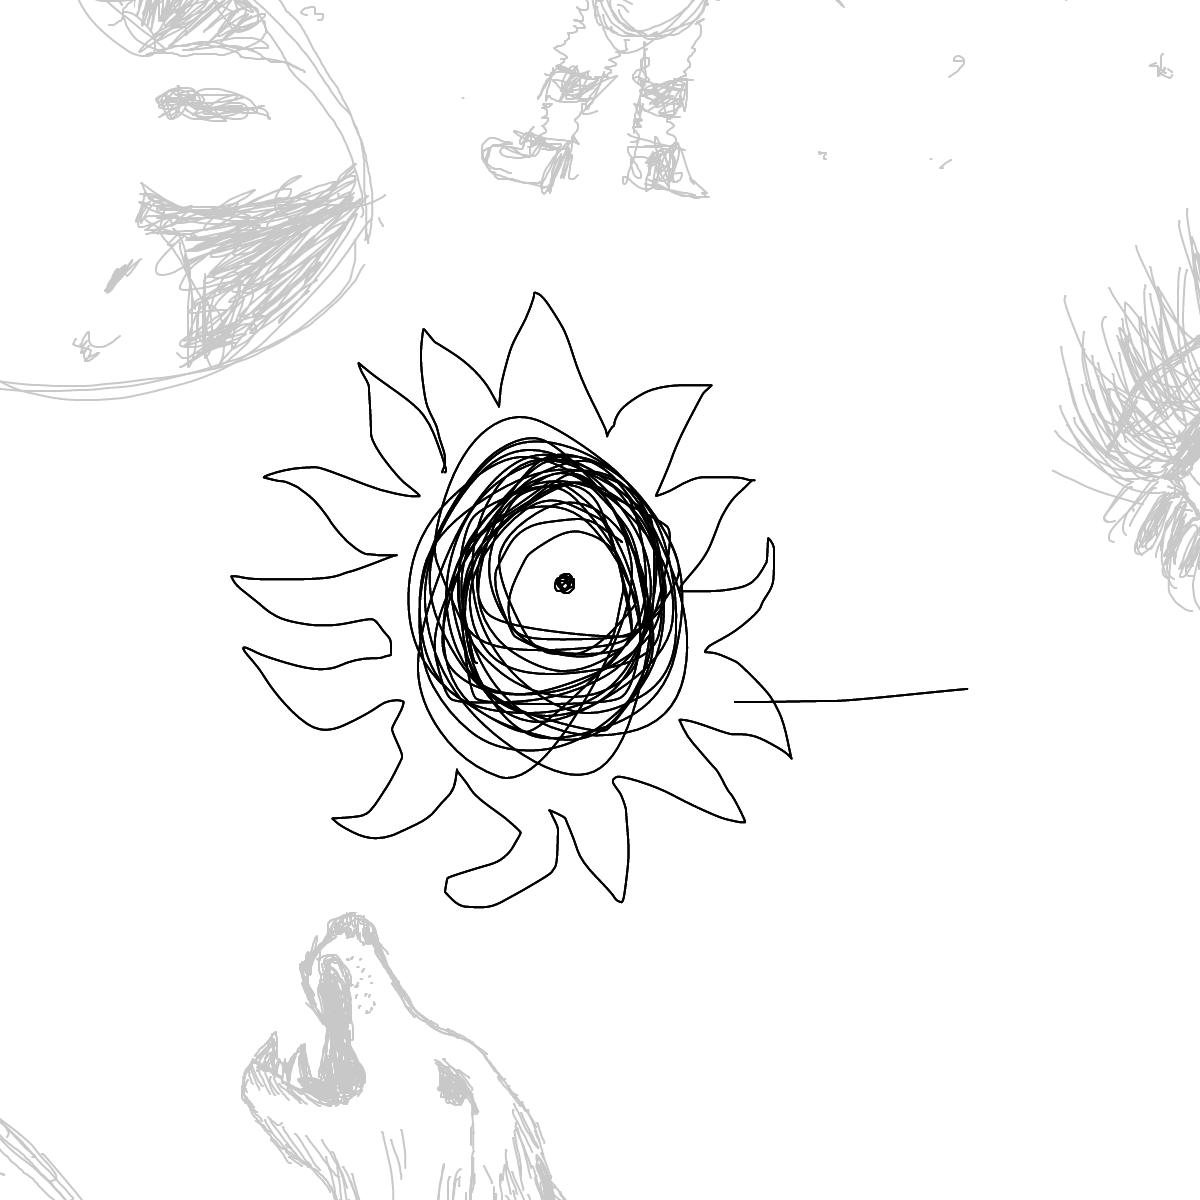 BAAAM drawing#2495 lat:52.0848007202148440lng: 5.1686525344848630